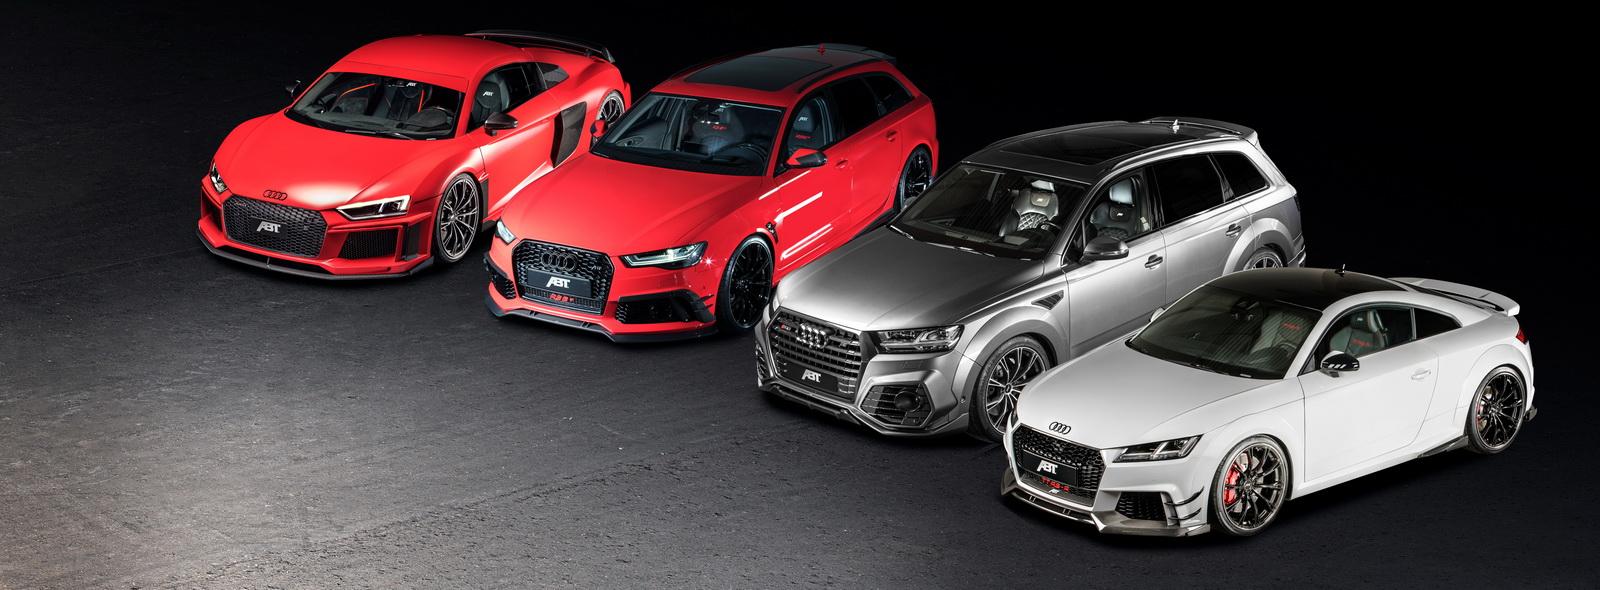 Audi_TT_RS-R_by_ABT_01